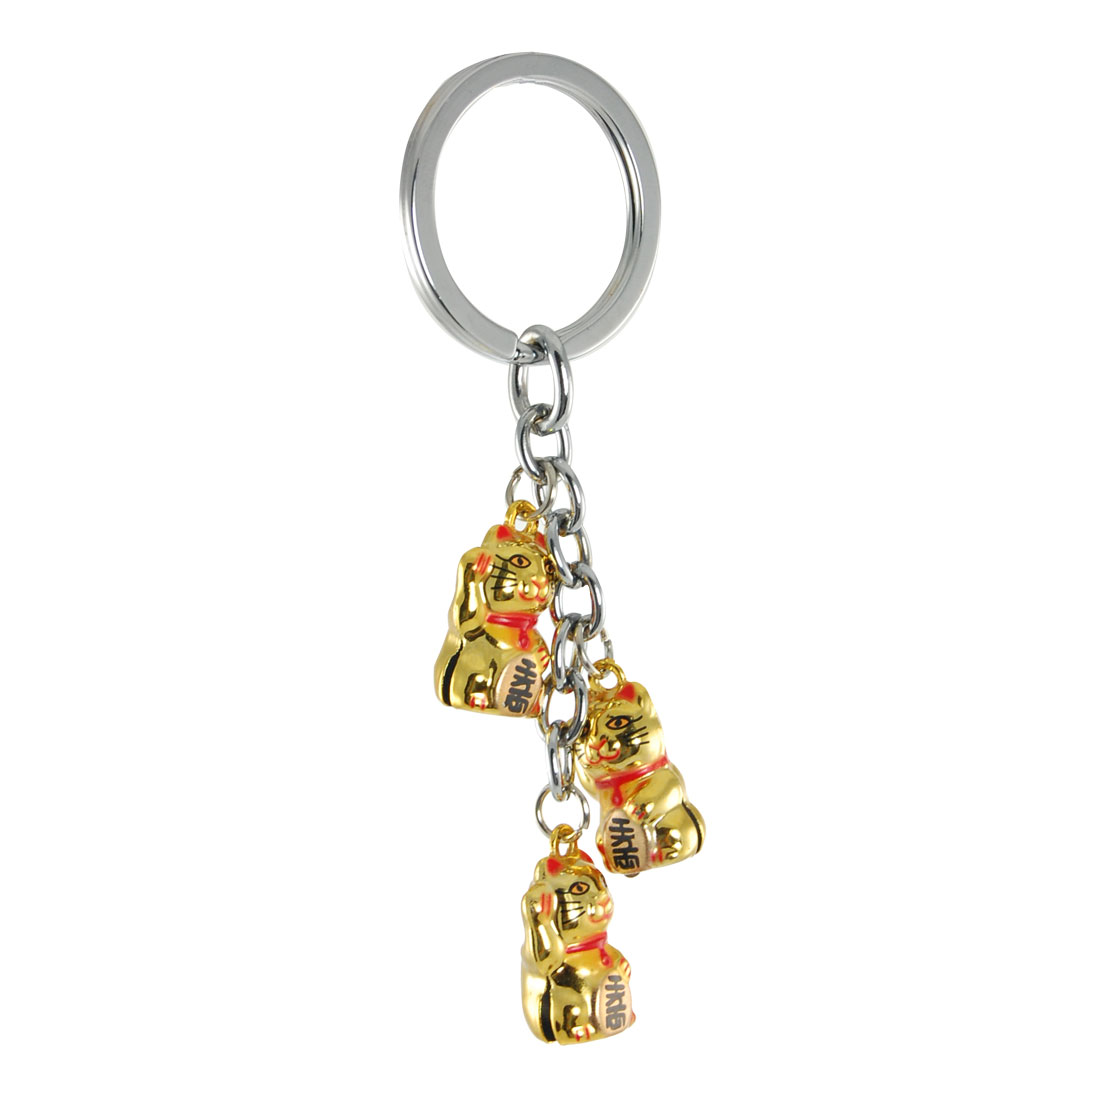 Handbag Red Necklace Gold Tone Maneki Neko Pendant Key Ring with Bell Sound